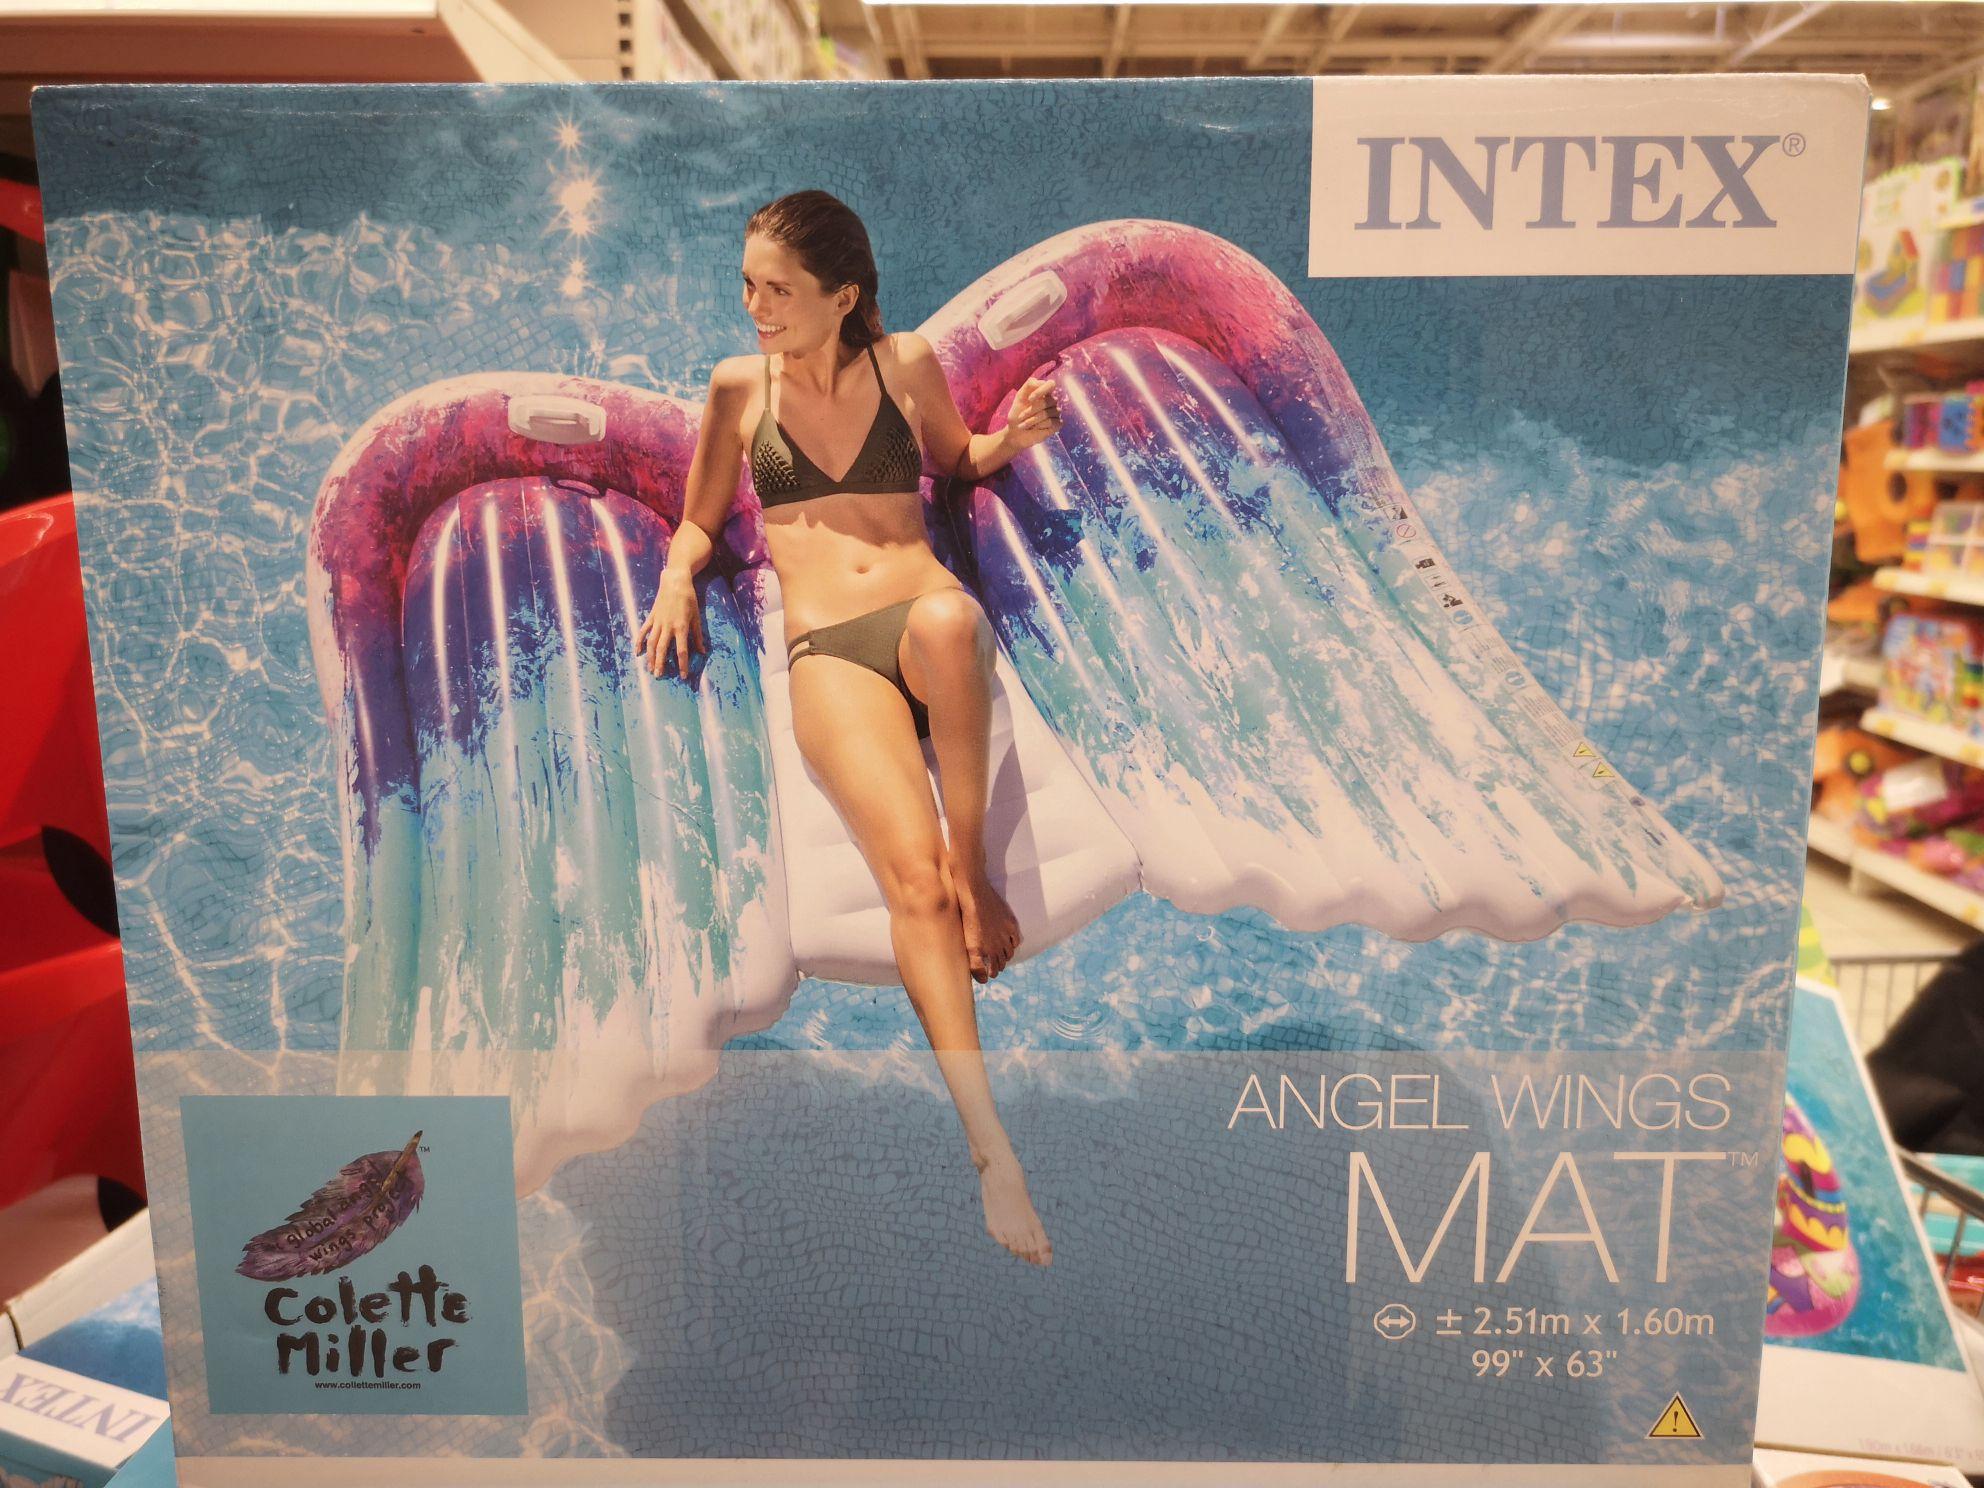 Materac Angel Wings INTEX Auchan Piaseczno